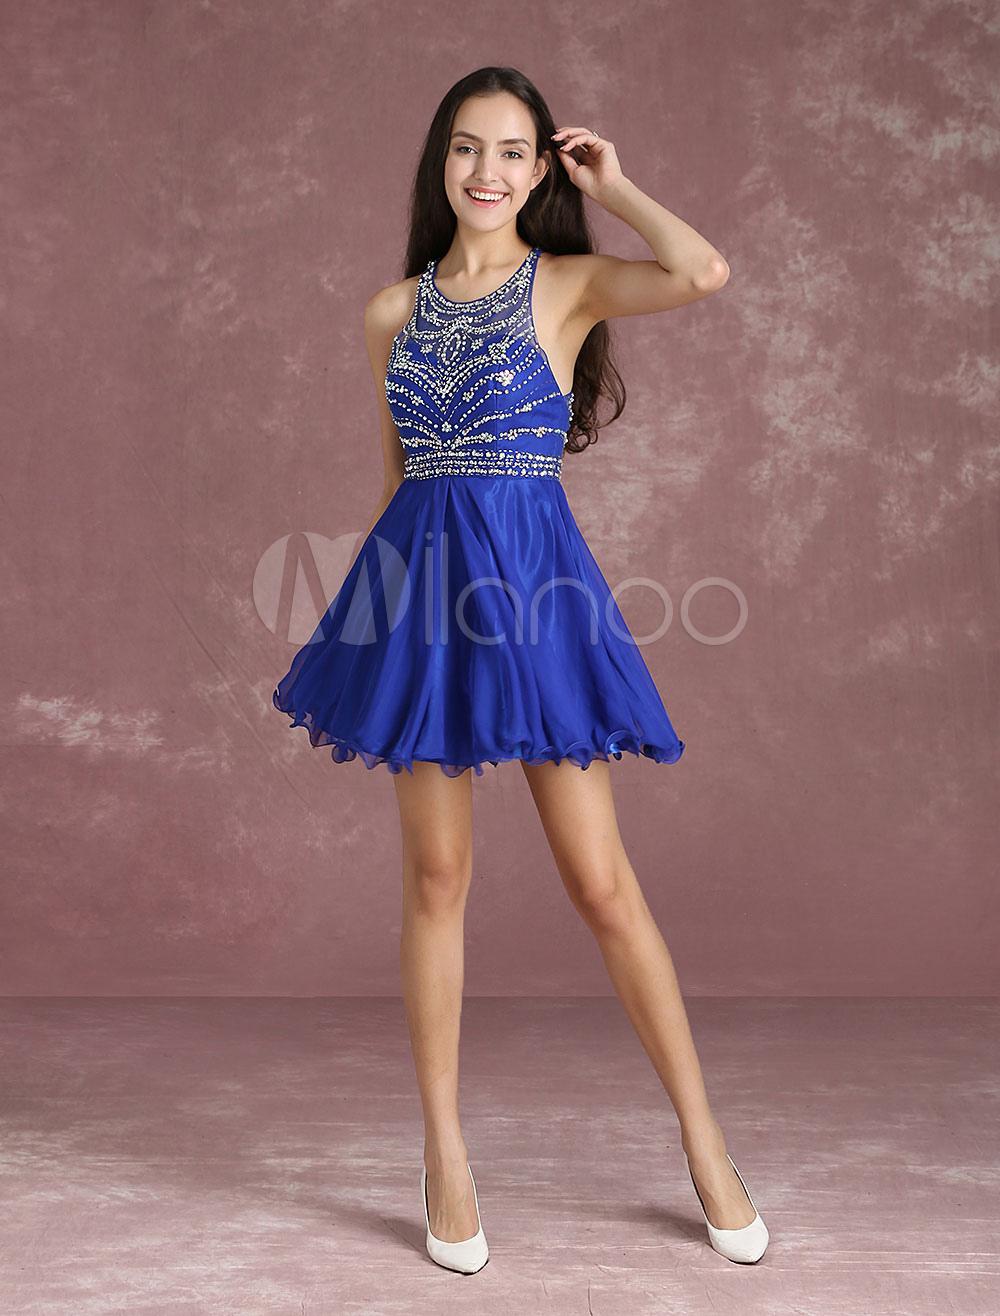 Chiffon Homecoming Dress Illusion Beading Prom Dresses Royal Blue Sleeveless Short Cocktail Dress (Wedding) photo